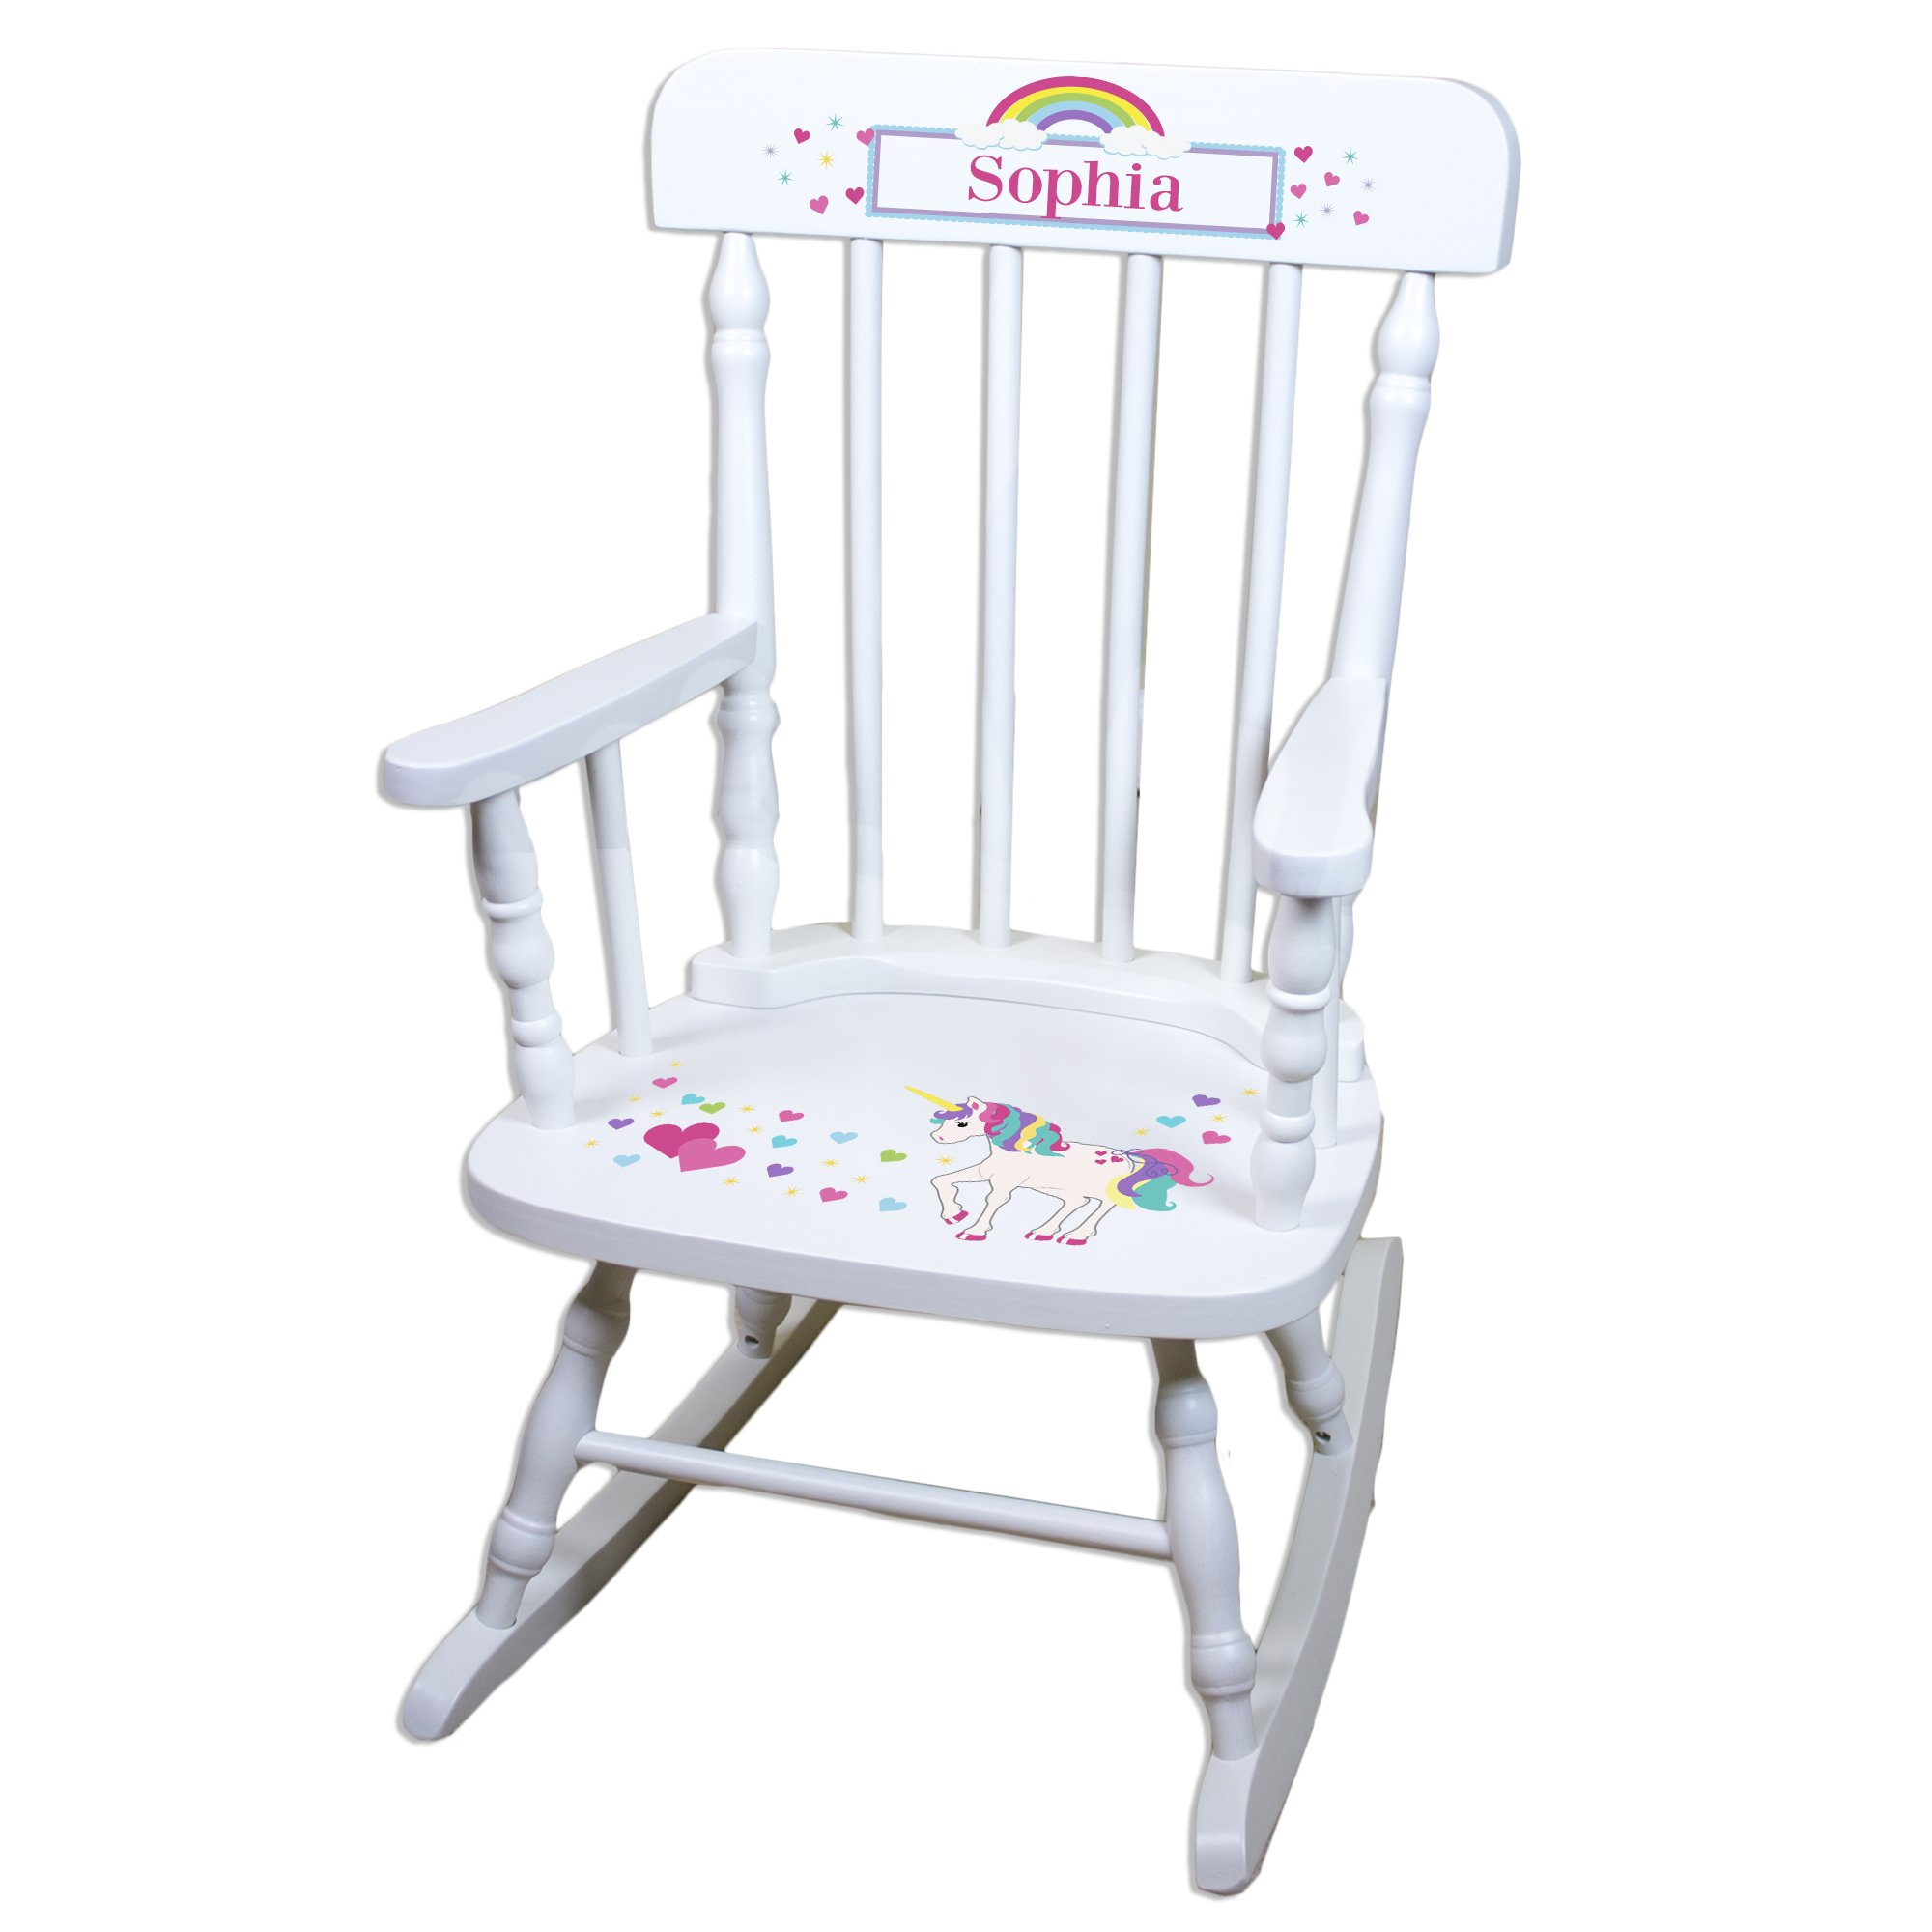 Children's Personalized White Unicorn Rocking Chair by MyBambino